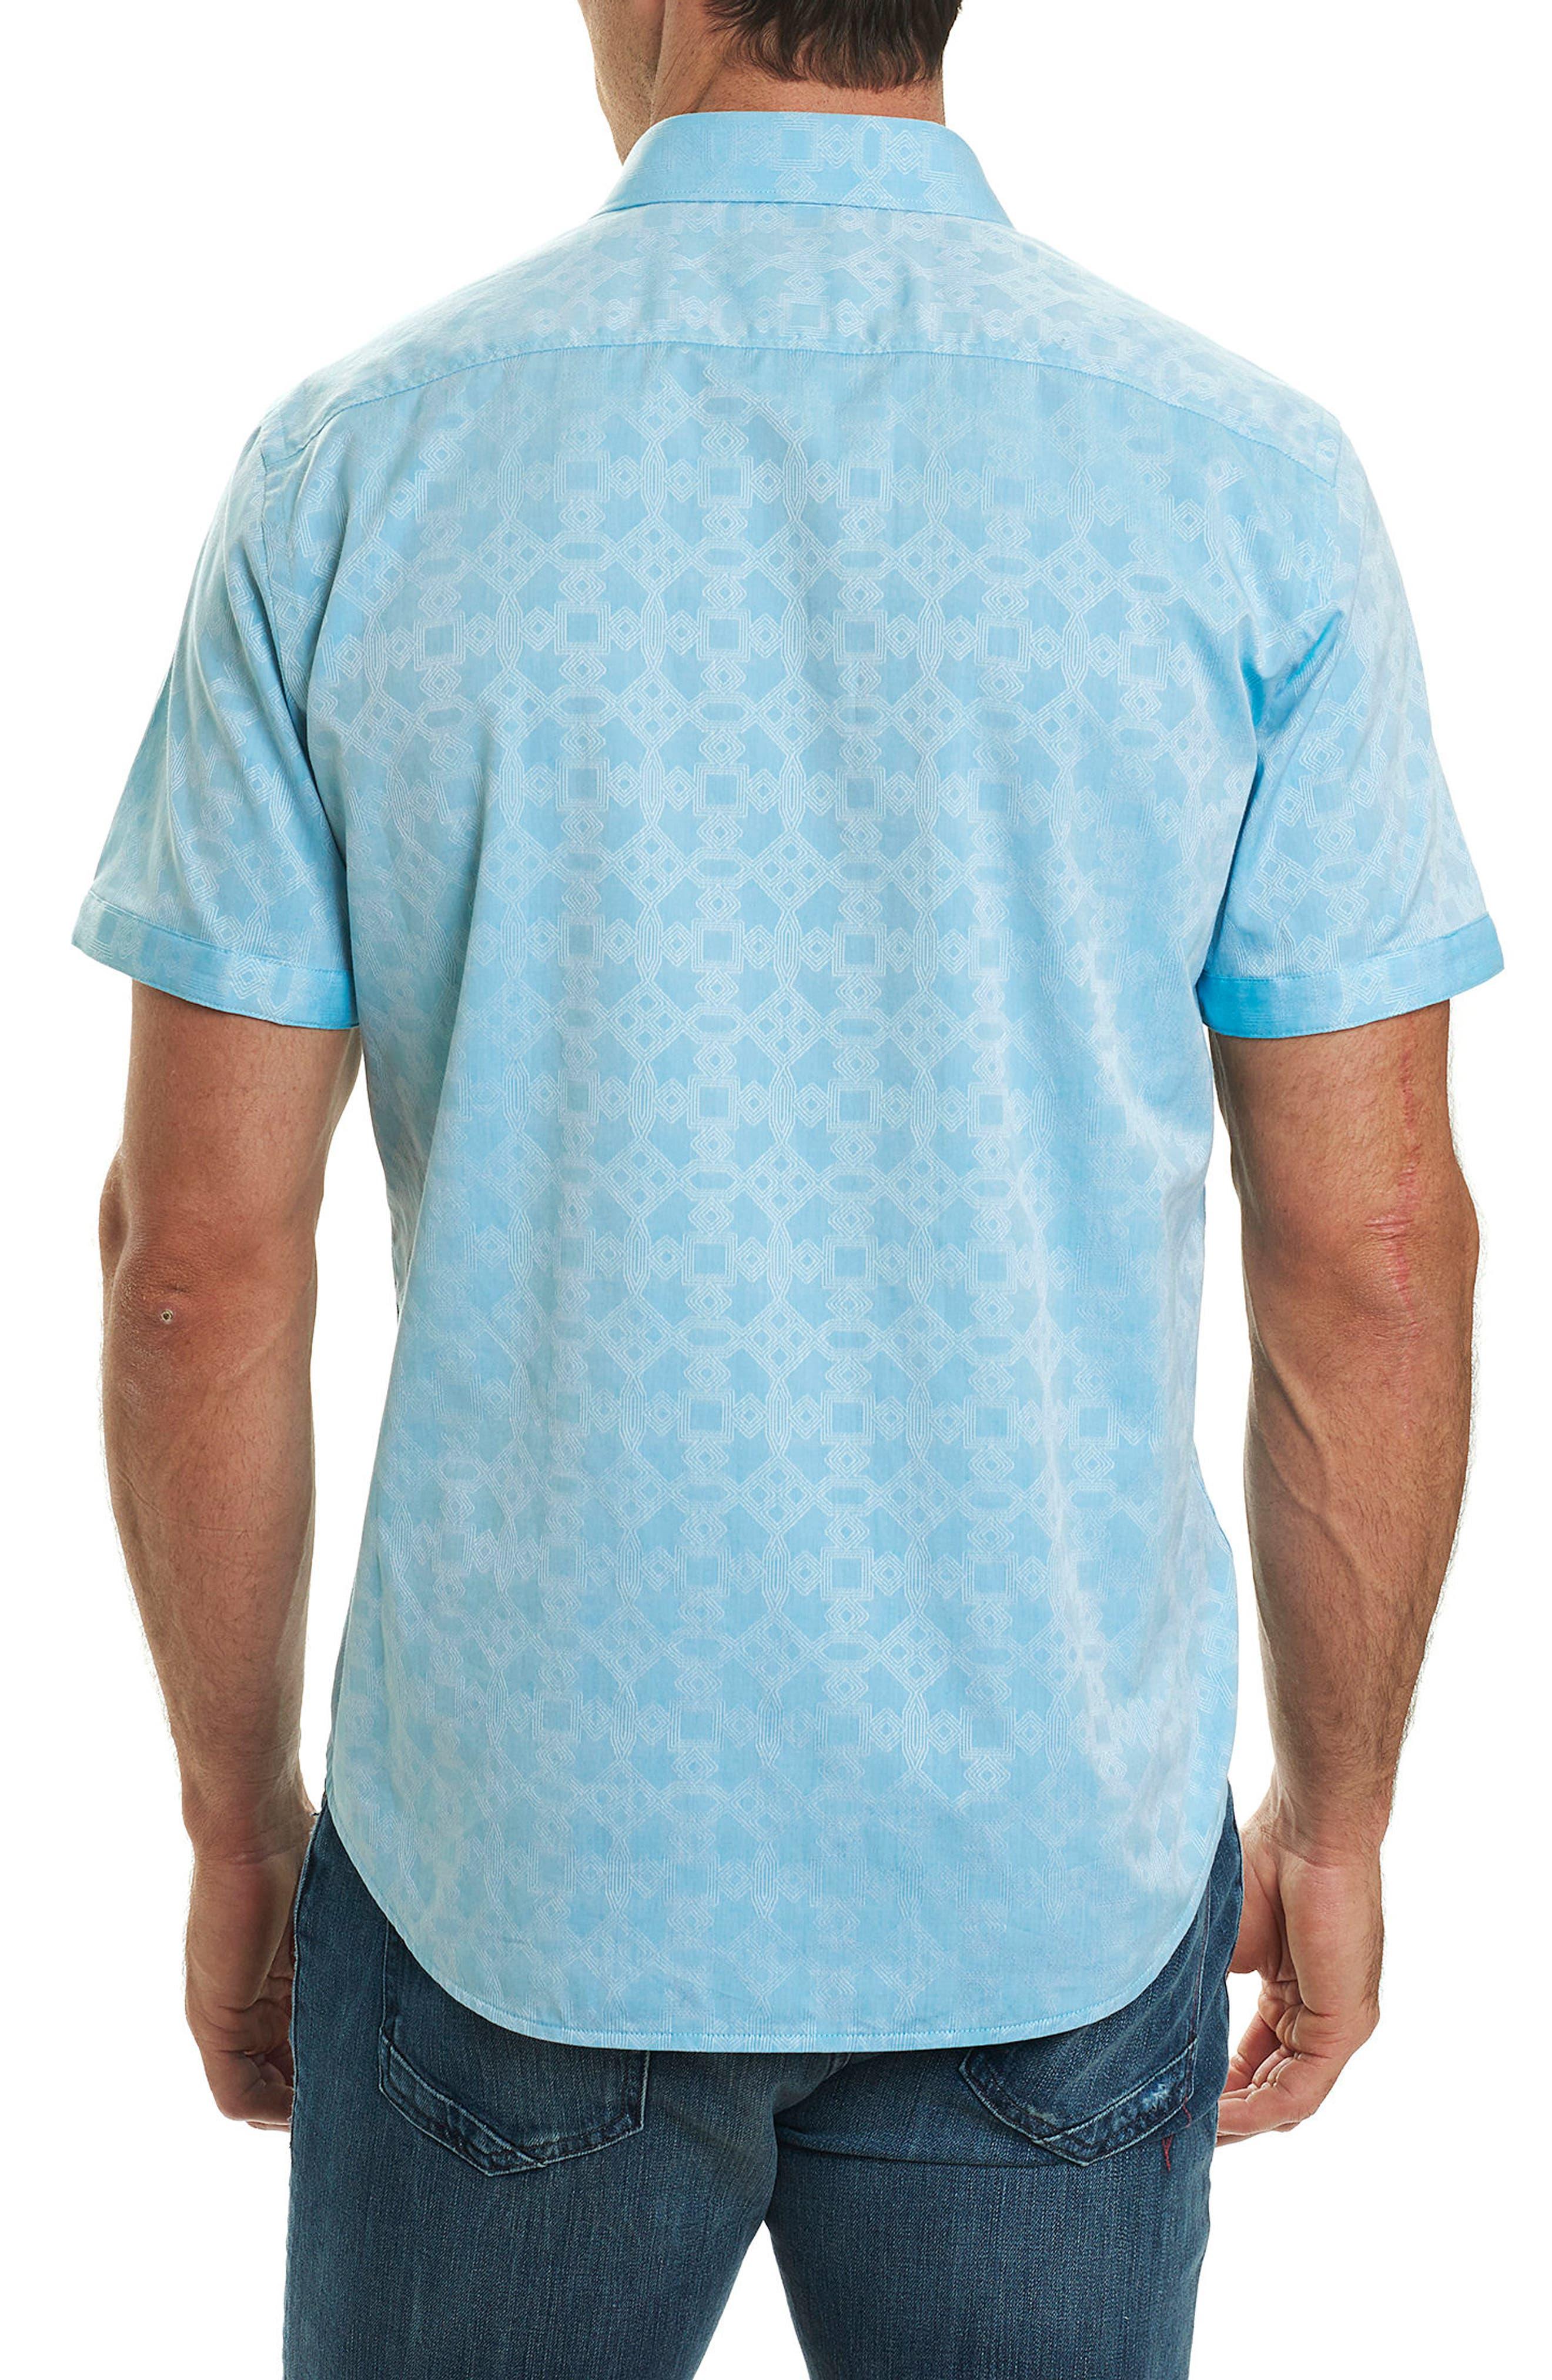 Maya Bay Classic Fit Jacquard Sport Shirt,                             Alternate thumbnail 2, color,                             Turquoise